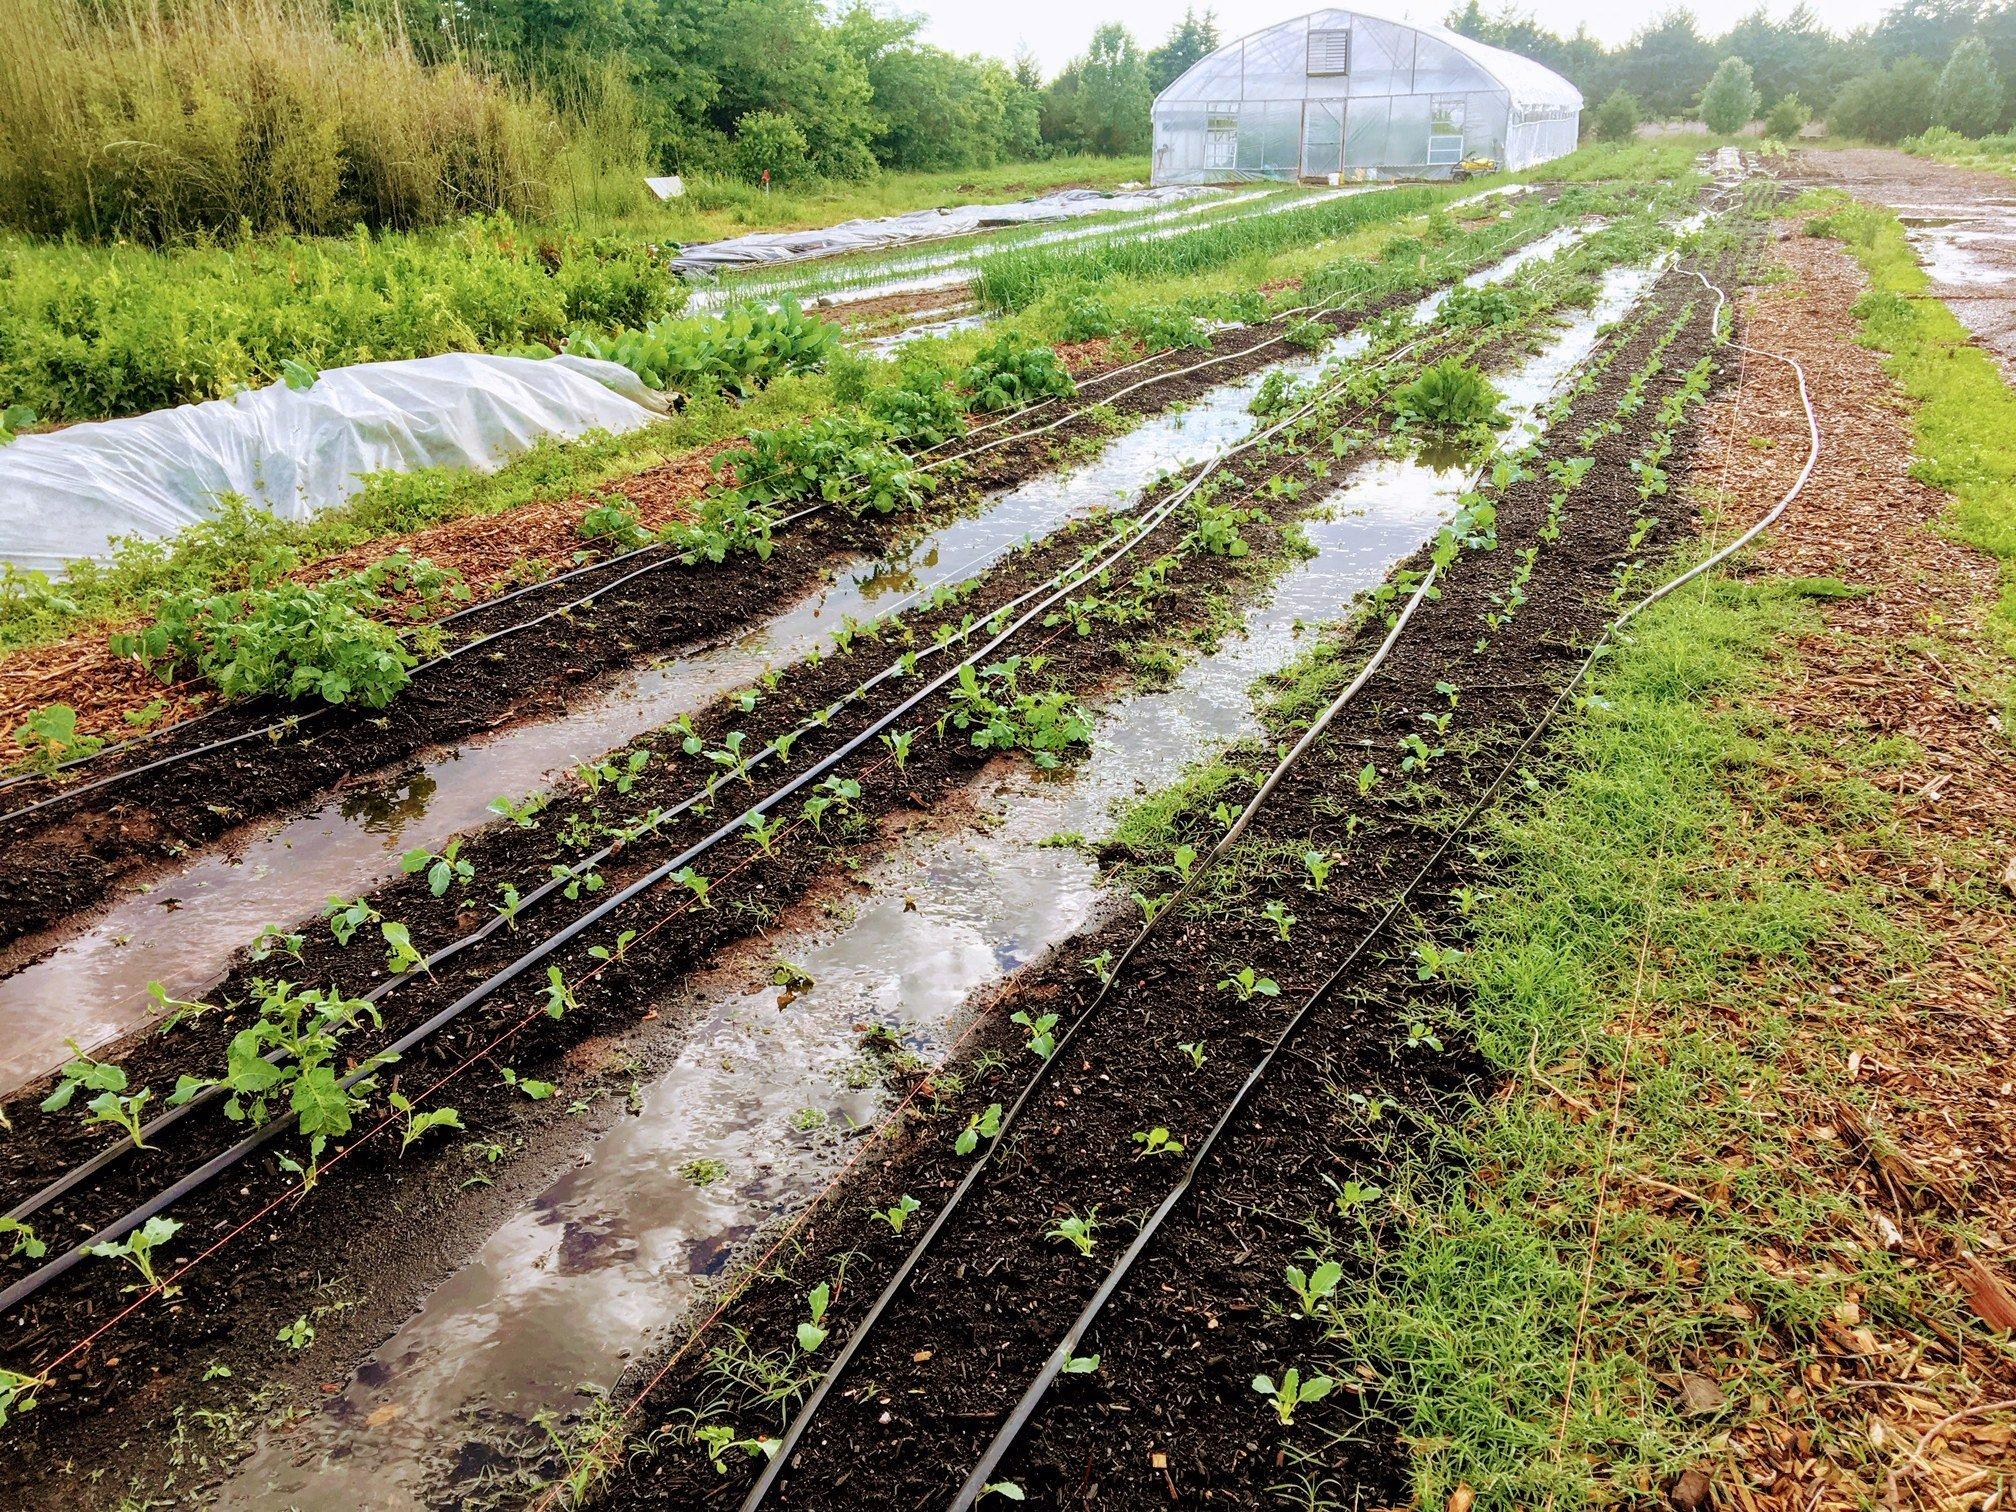 Farm Happenings for June 1, 2019